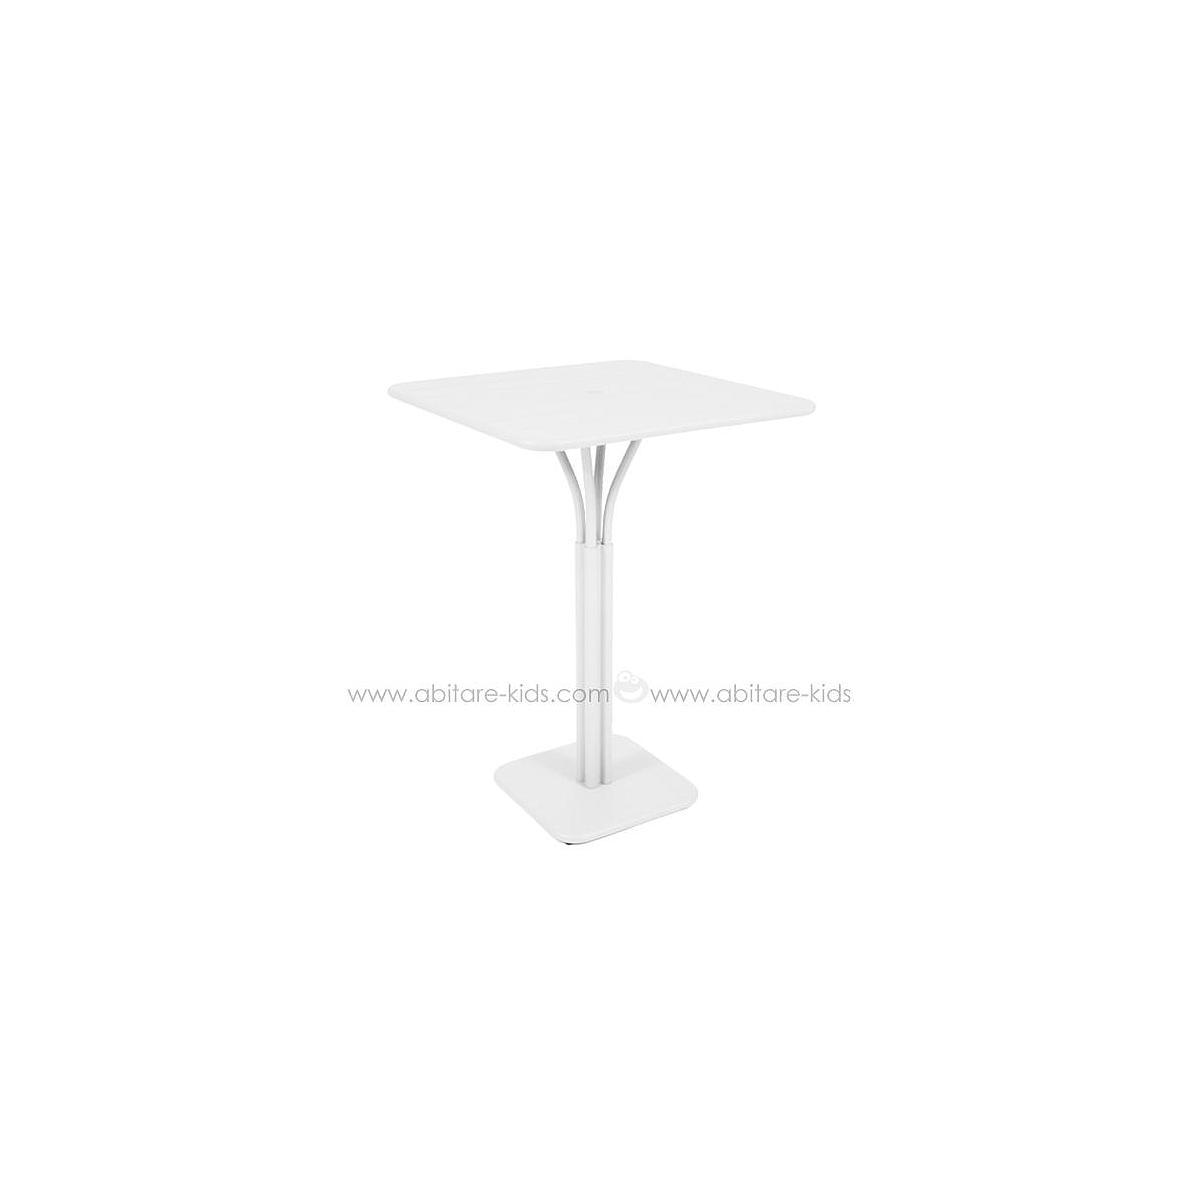 LUXEMBOURG by Fermob guéridon haut 80x80cm blanc coton